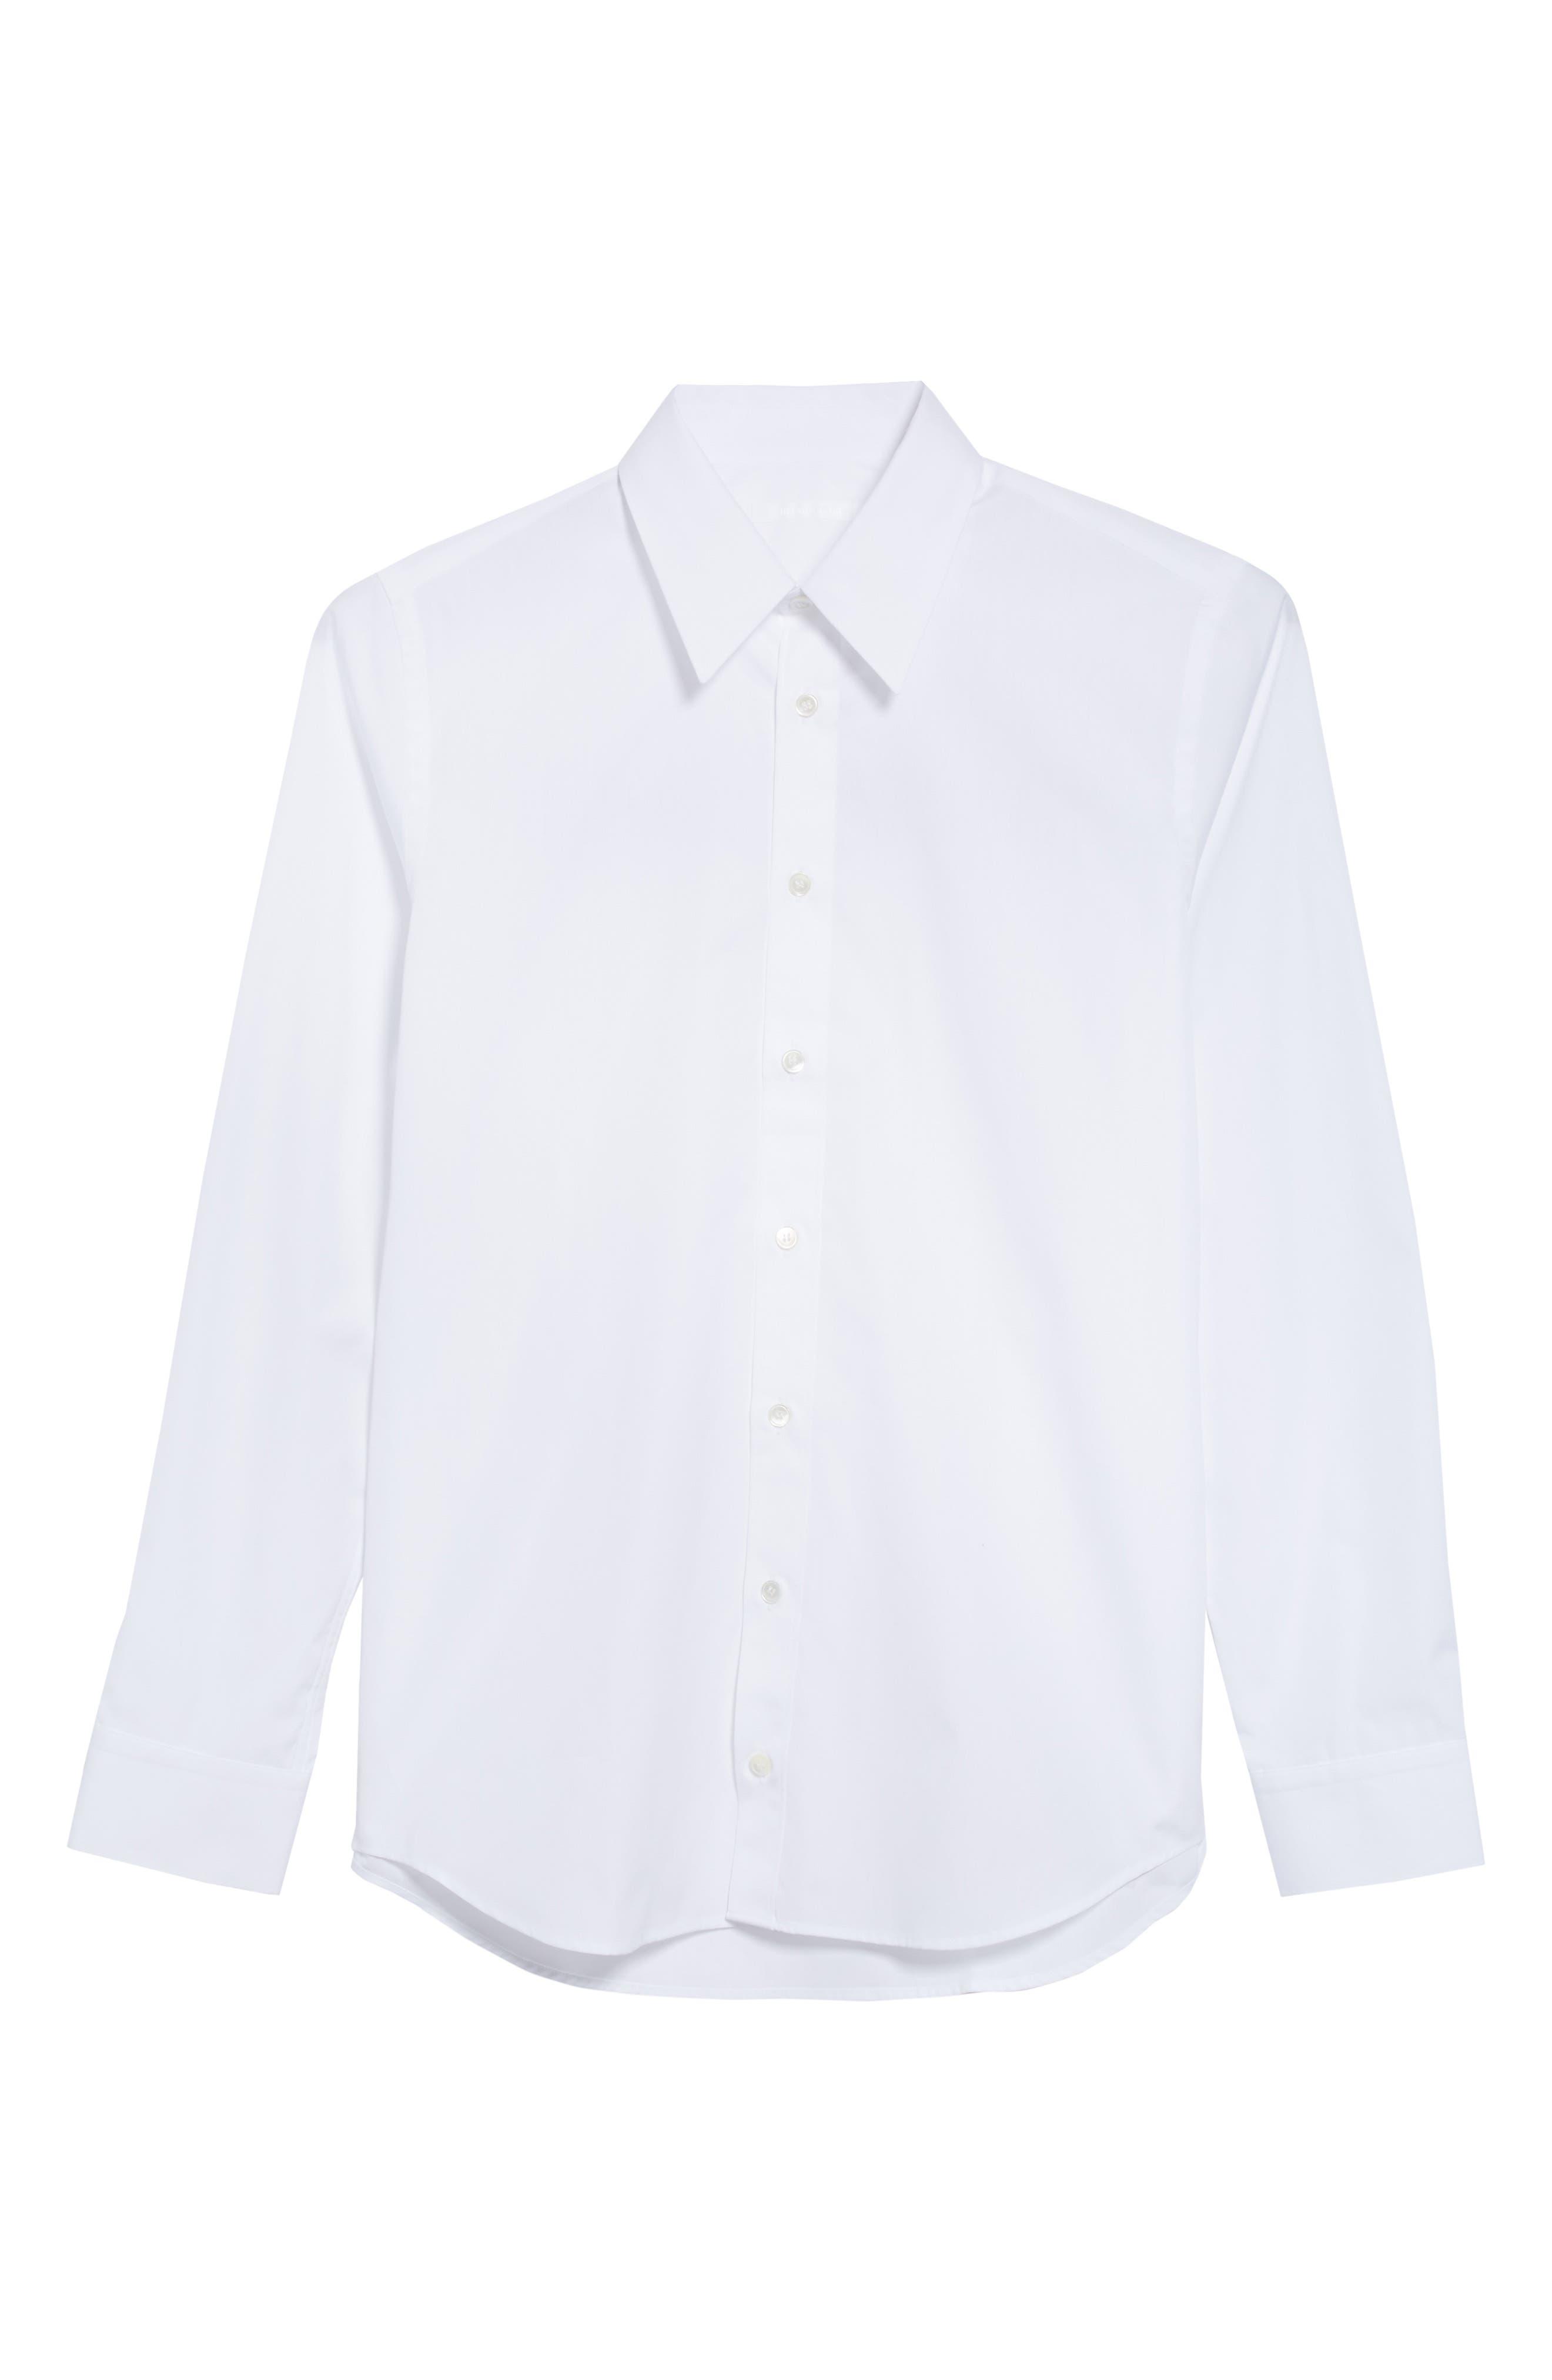 HELMUT LANG, Logo Back Long Sleeve Woven Shirt, Alternate thumbnail 6, color, WHITE AND BLACK